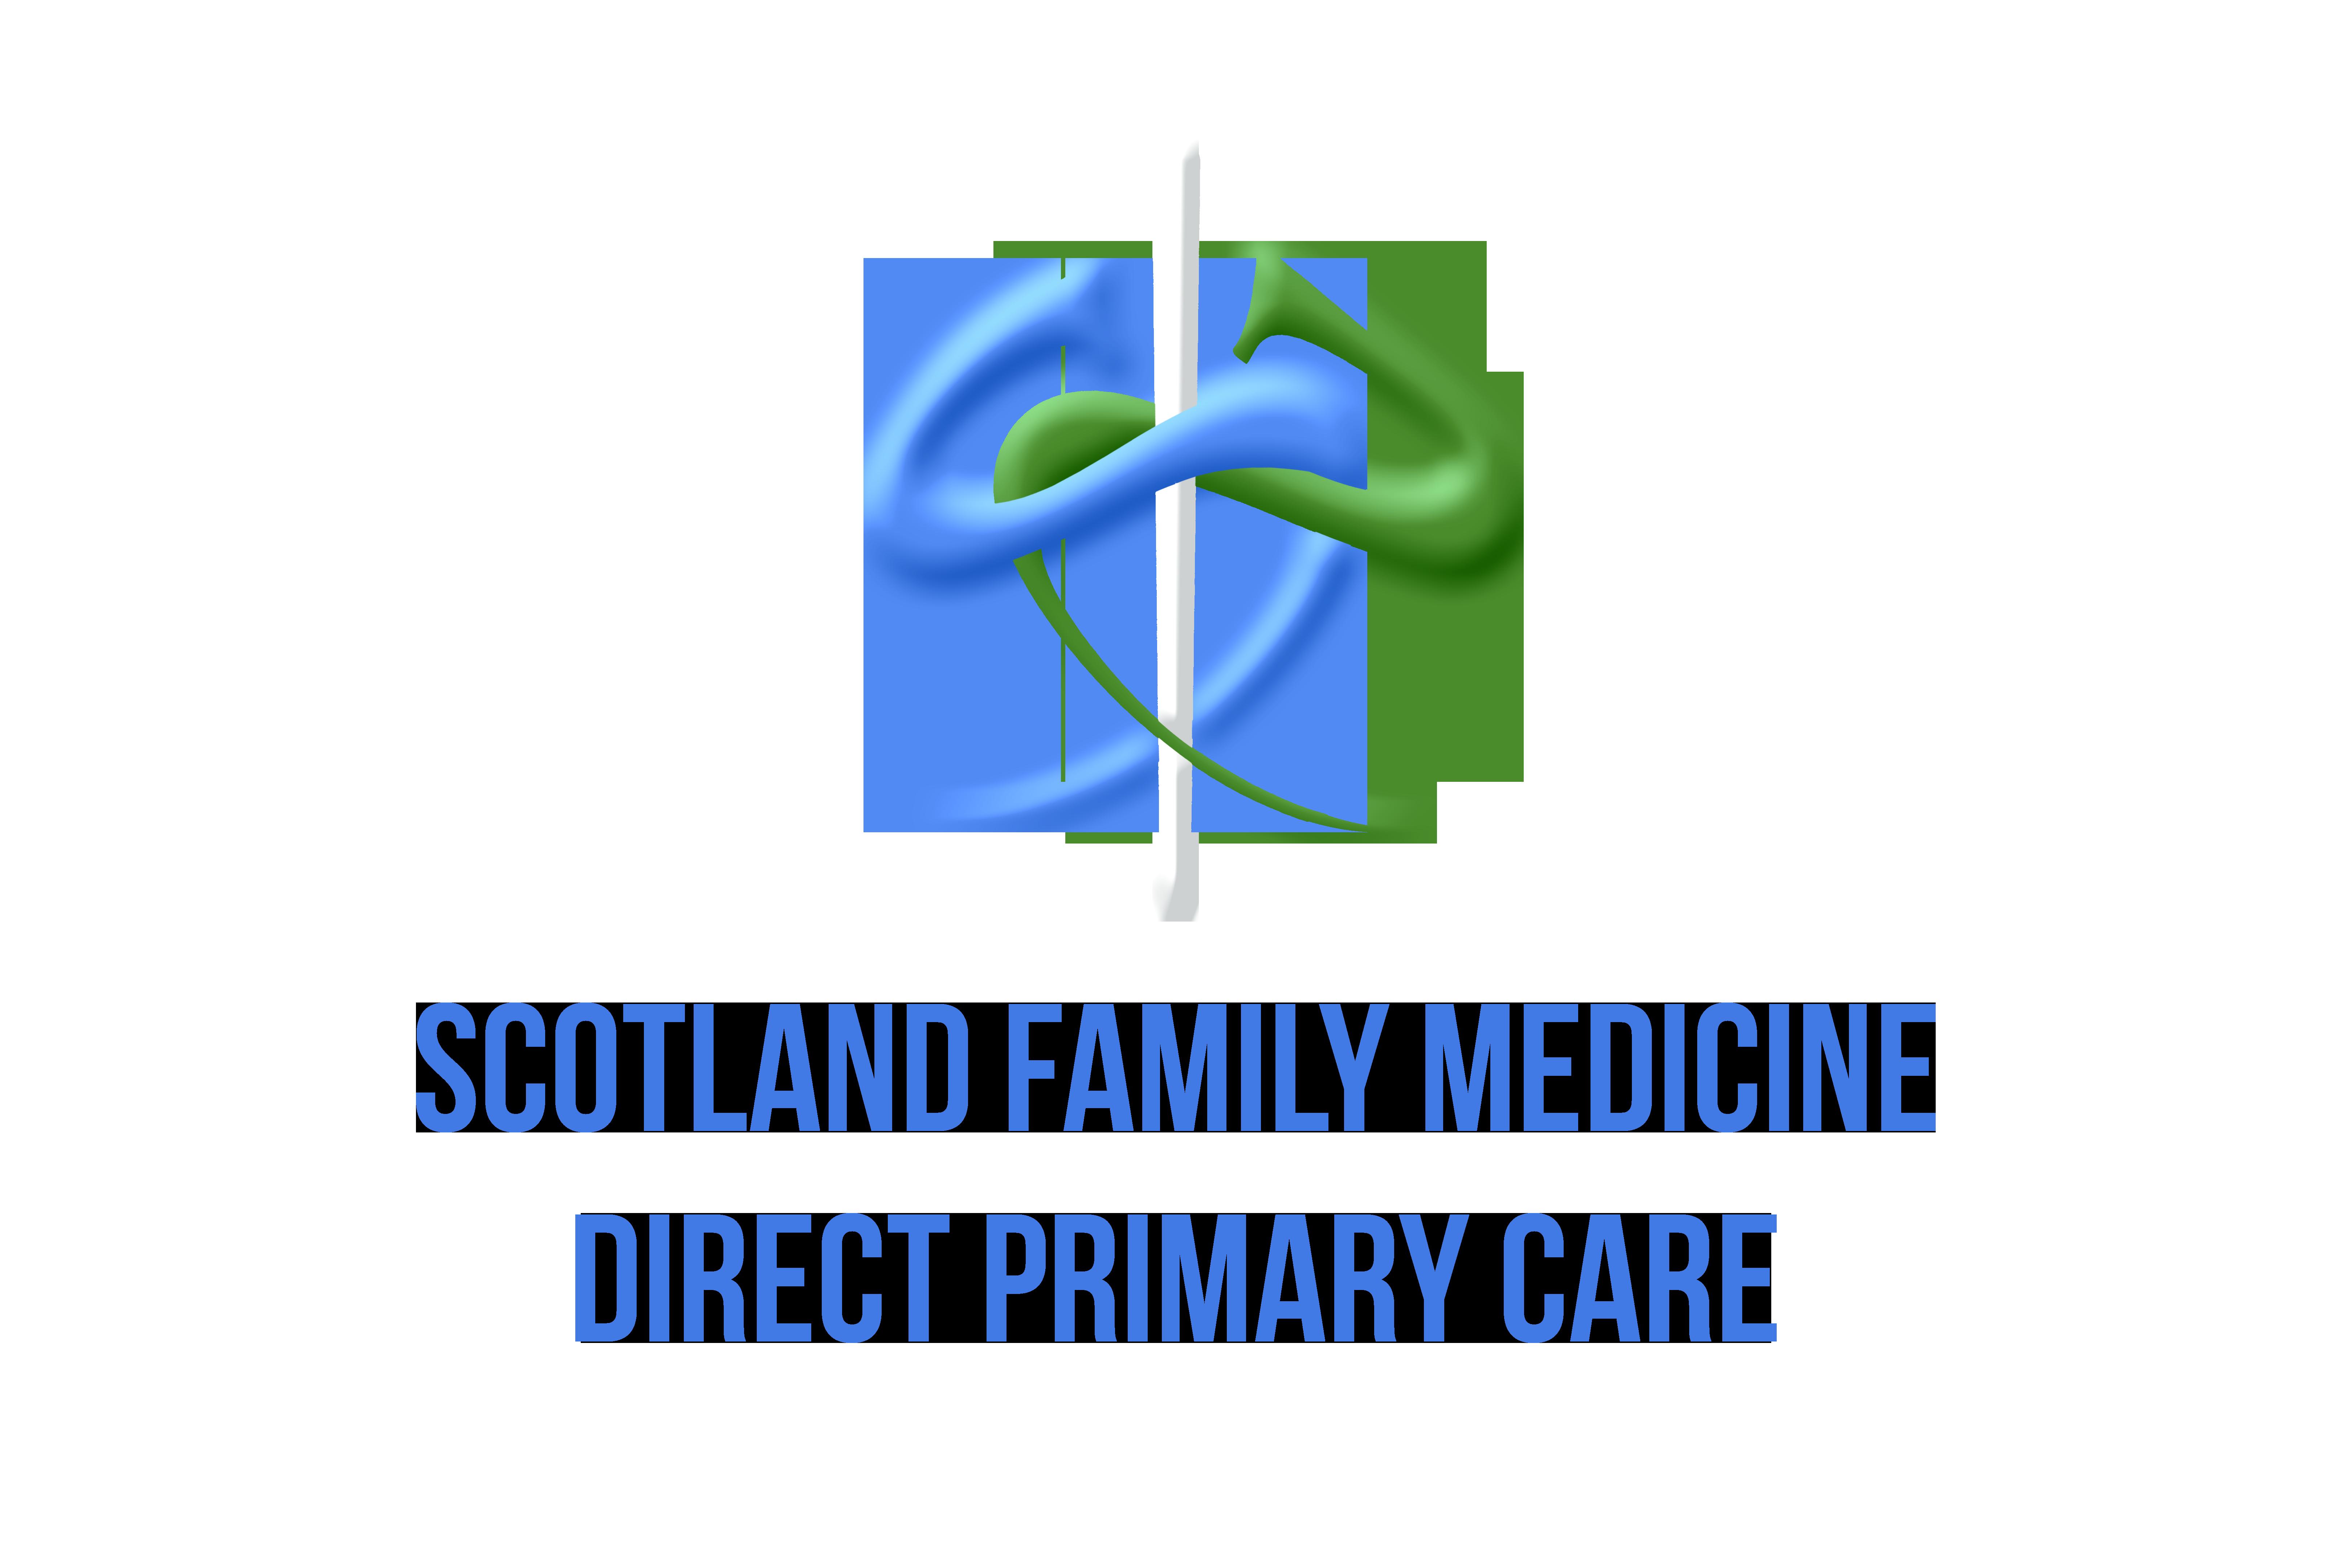 Scotland Family Medicine logo